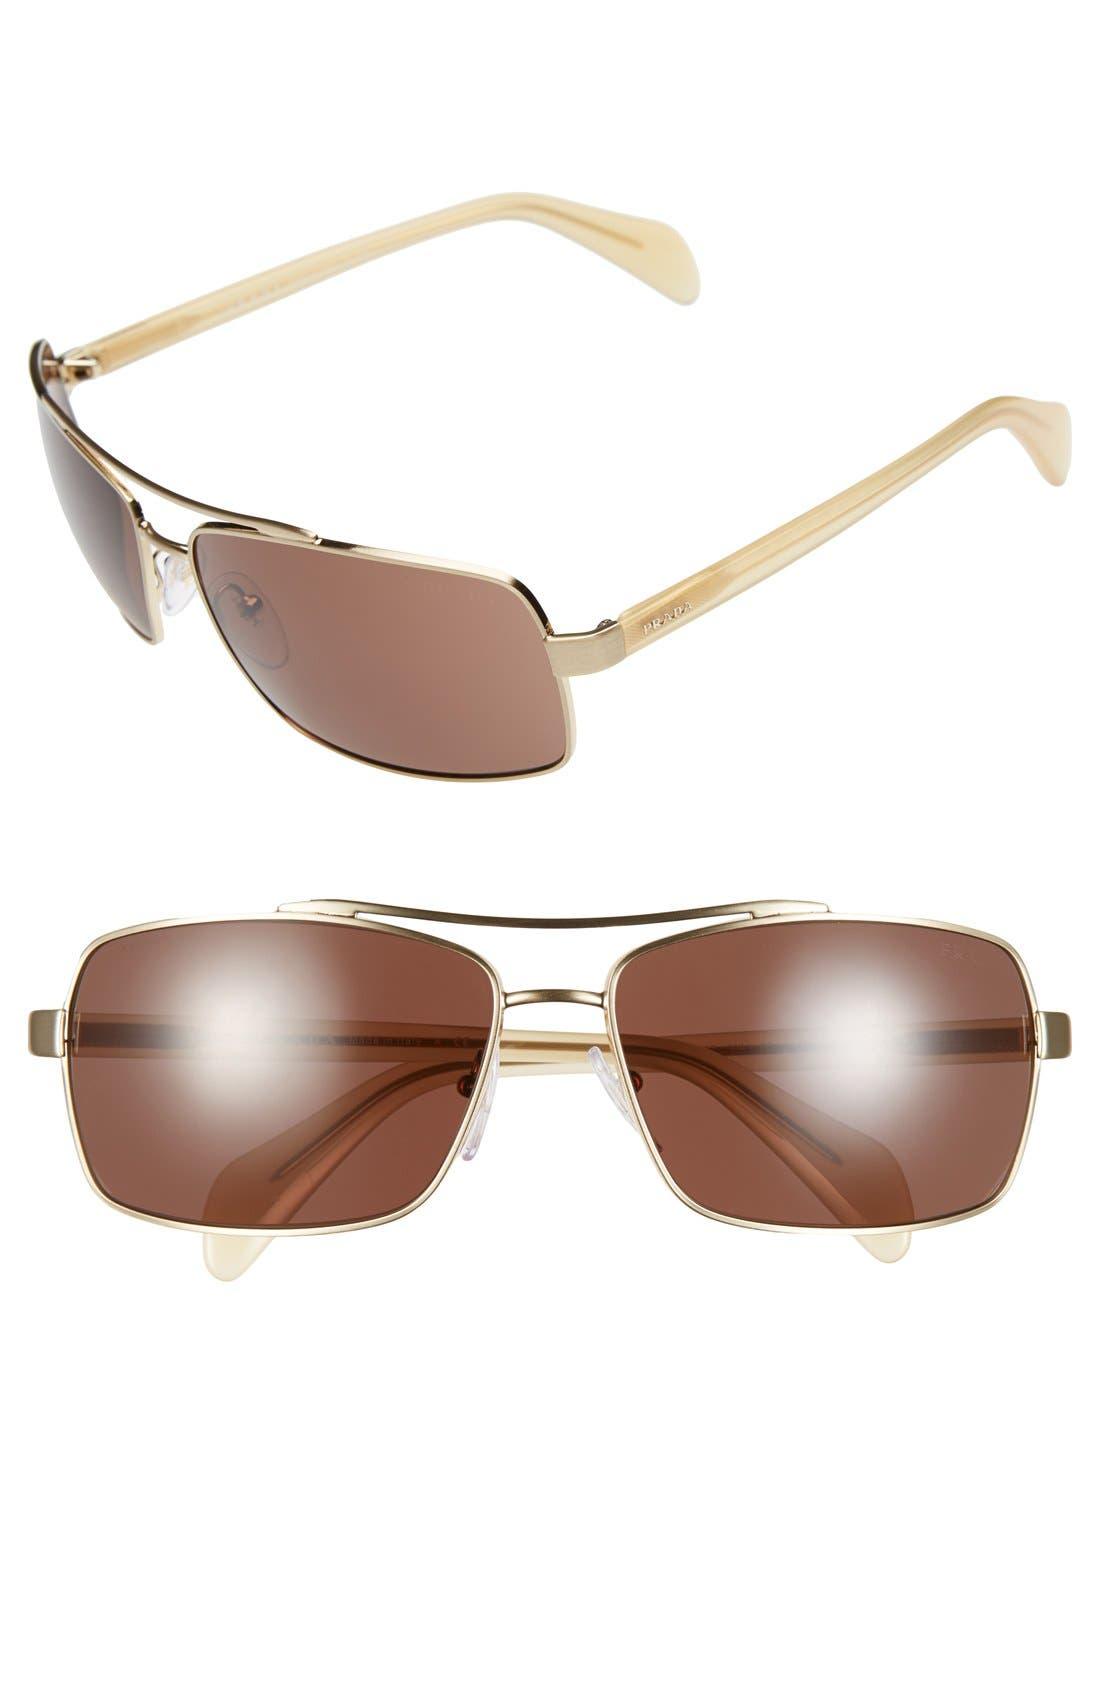 Main Image - Prada 'Society' 63mm Sunglasses